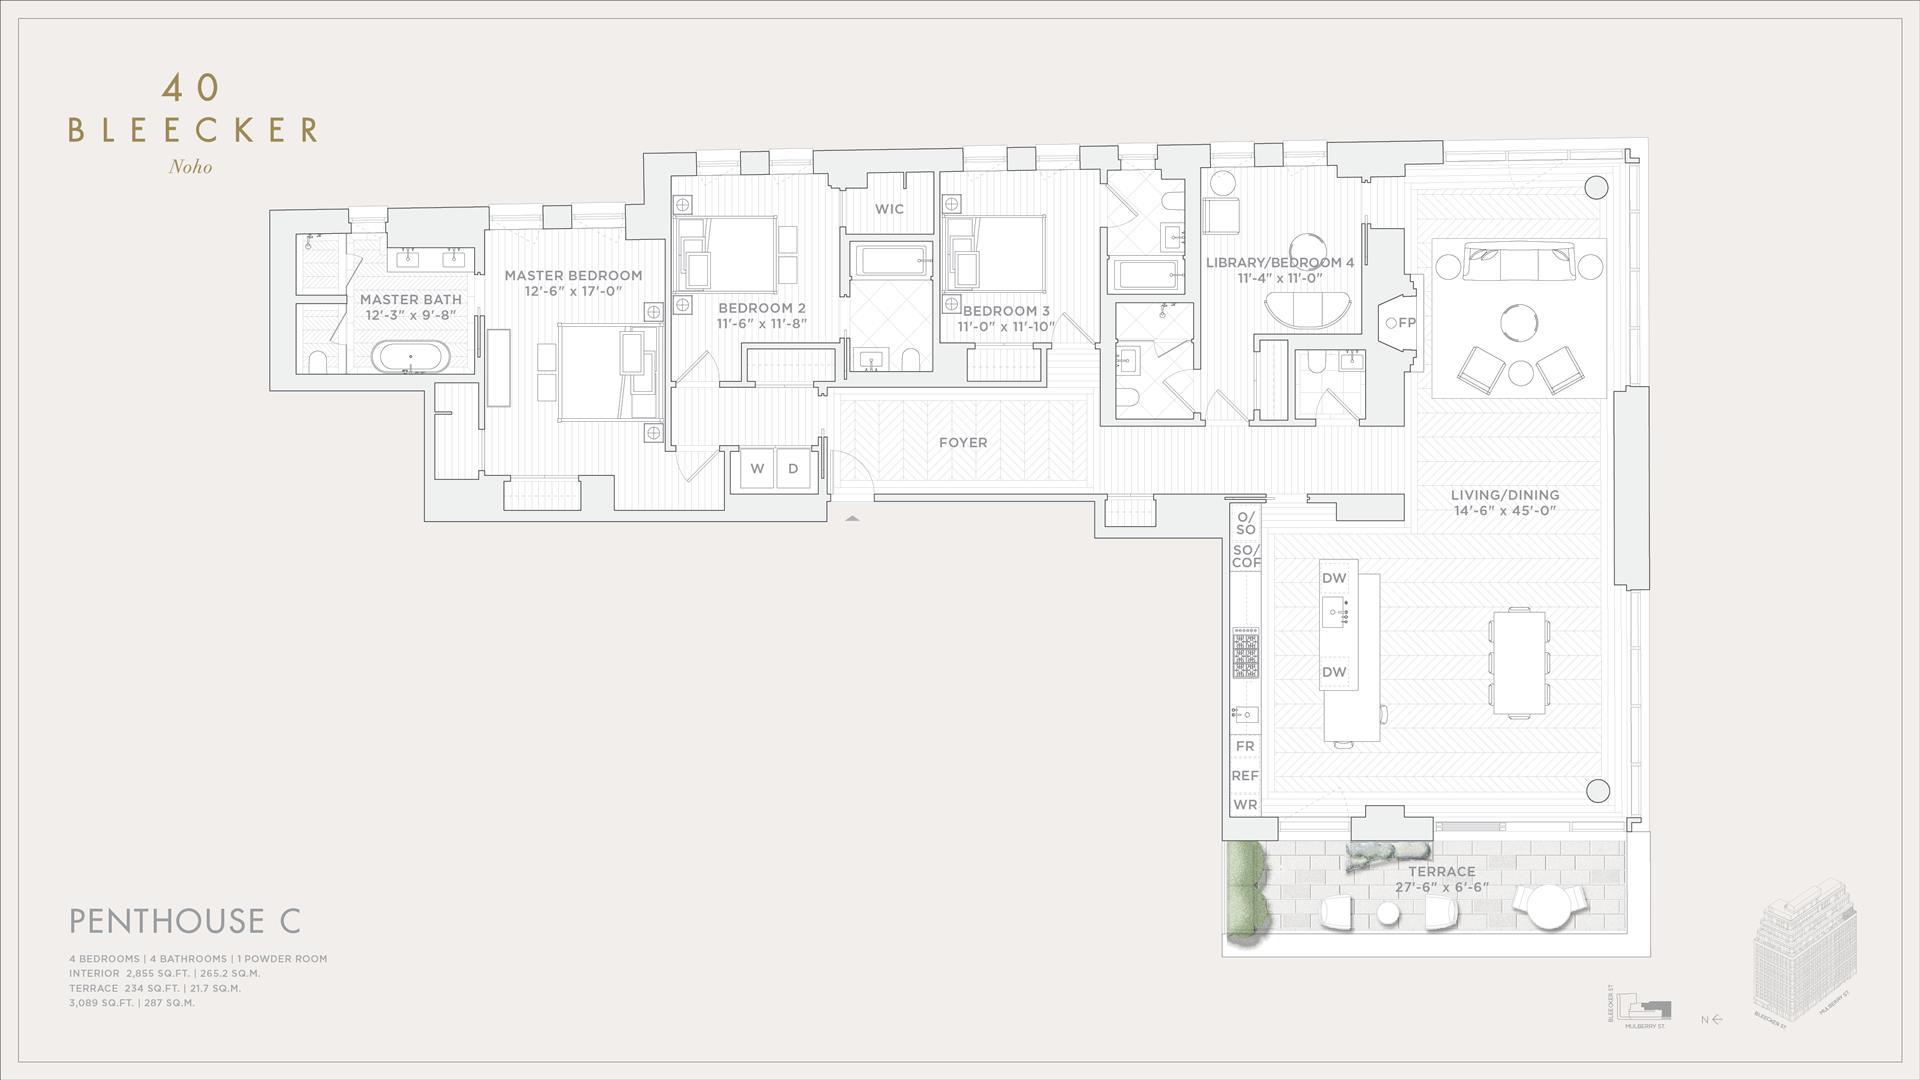 Floor plan of 40 Bleecker Street, PHC - NoHo, New York